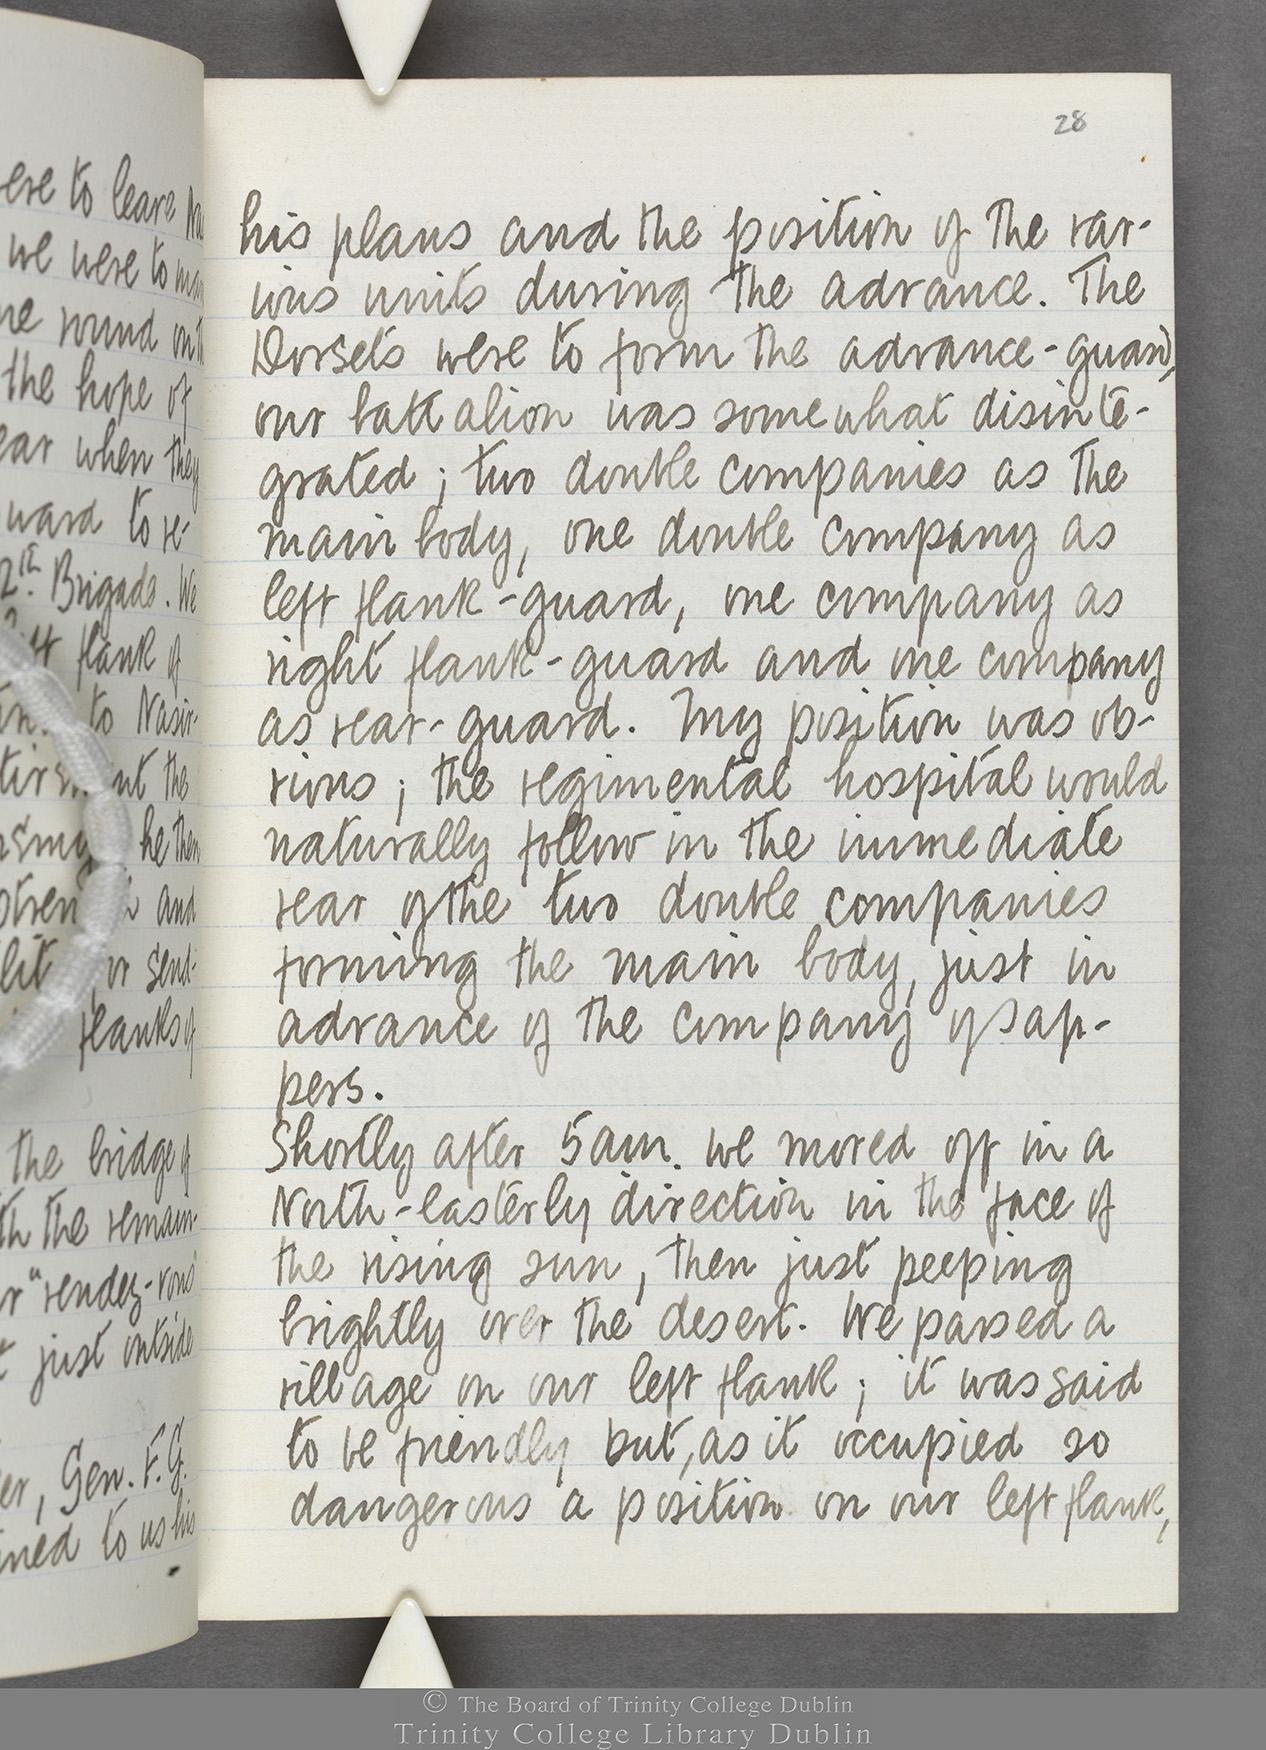 TCD MS 10516 folio 28 recto